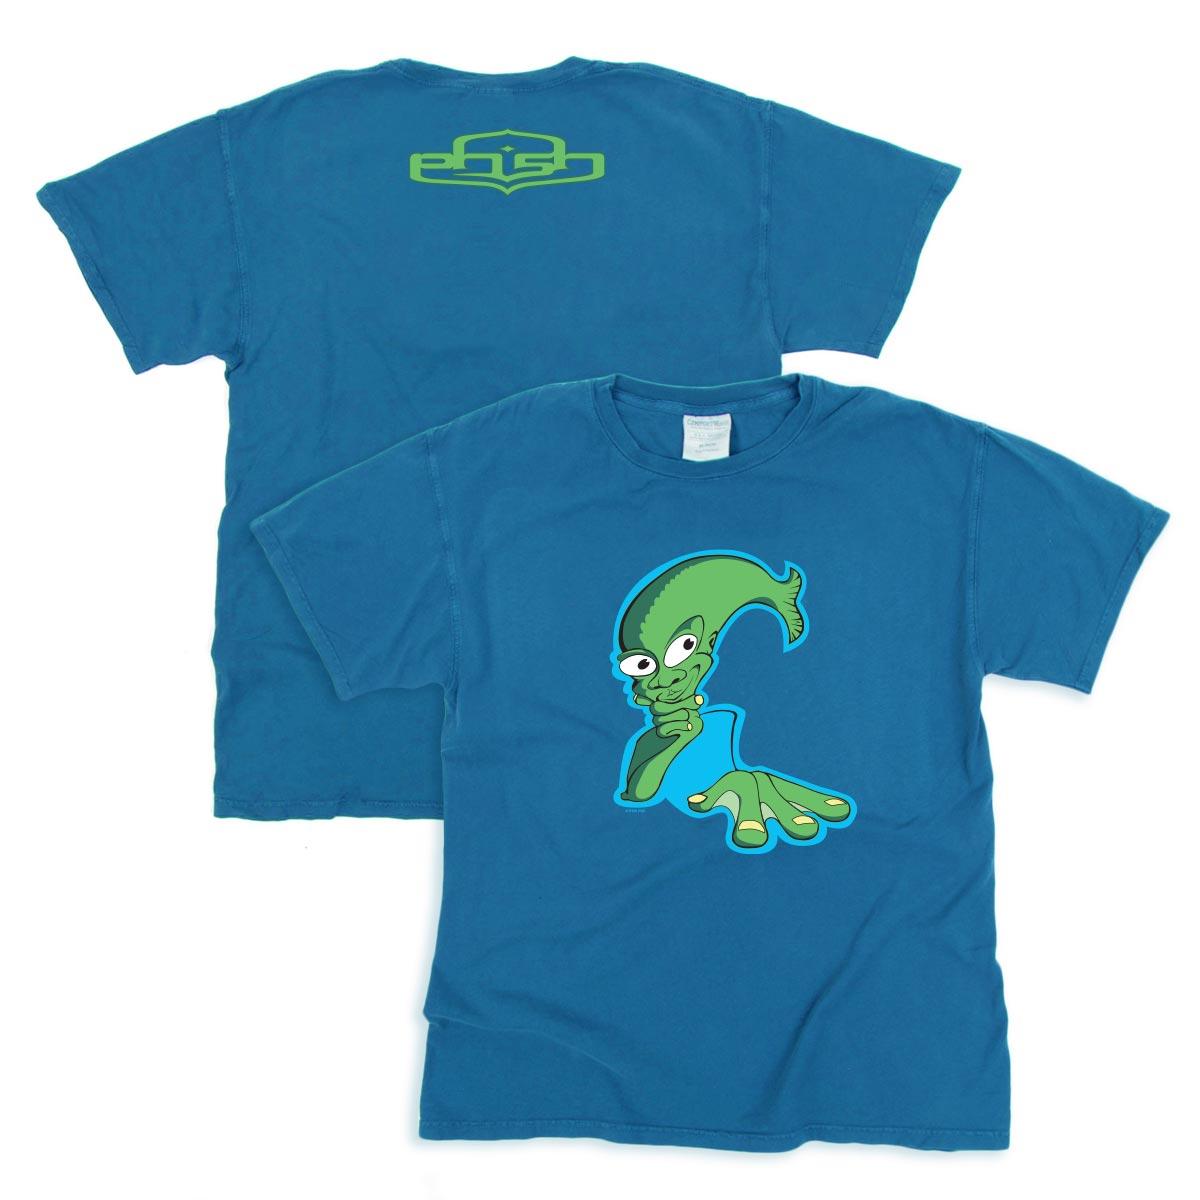 Aquaman Tee on Summer Blue